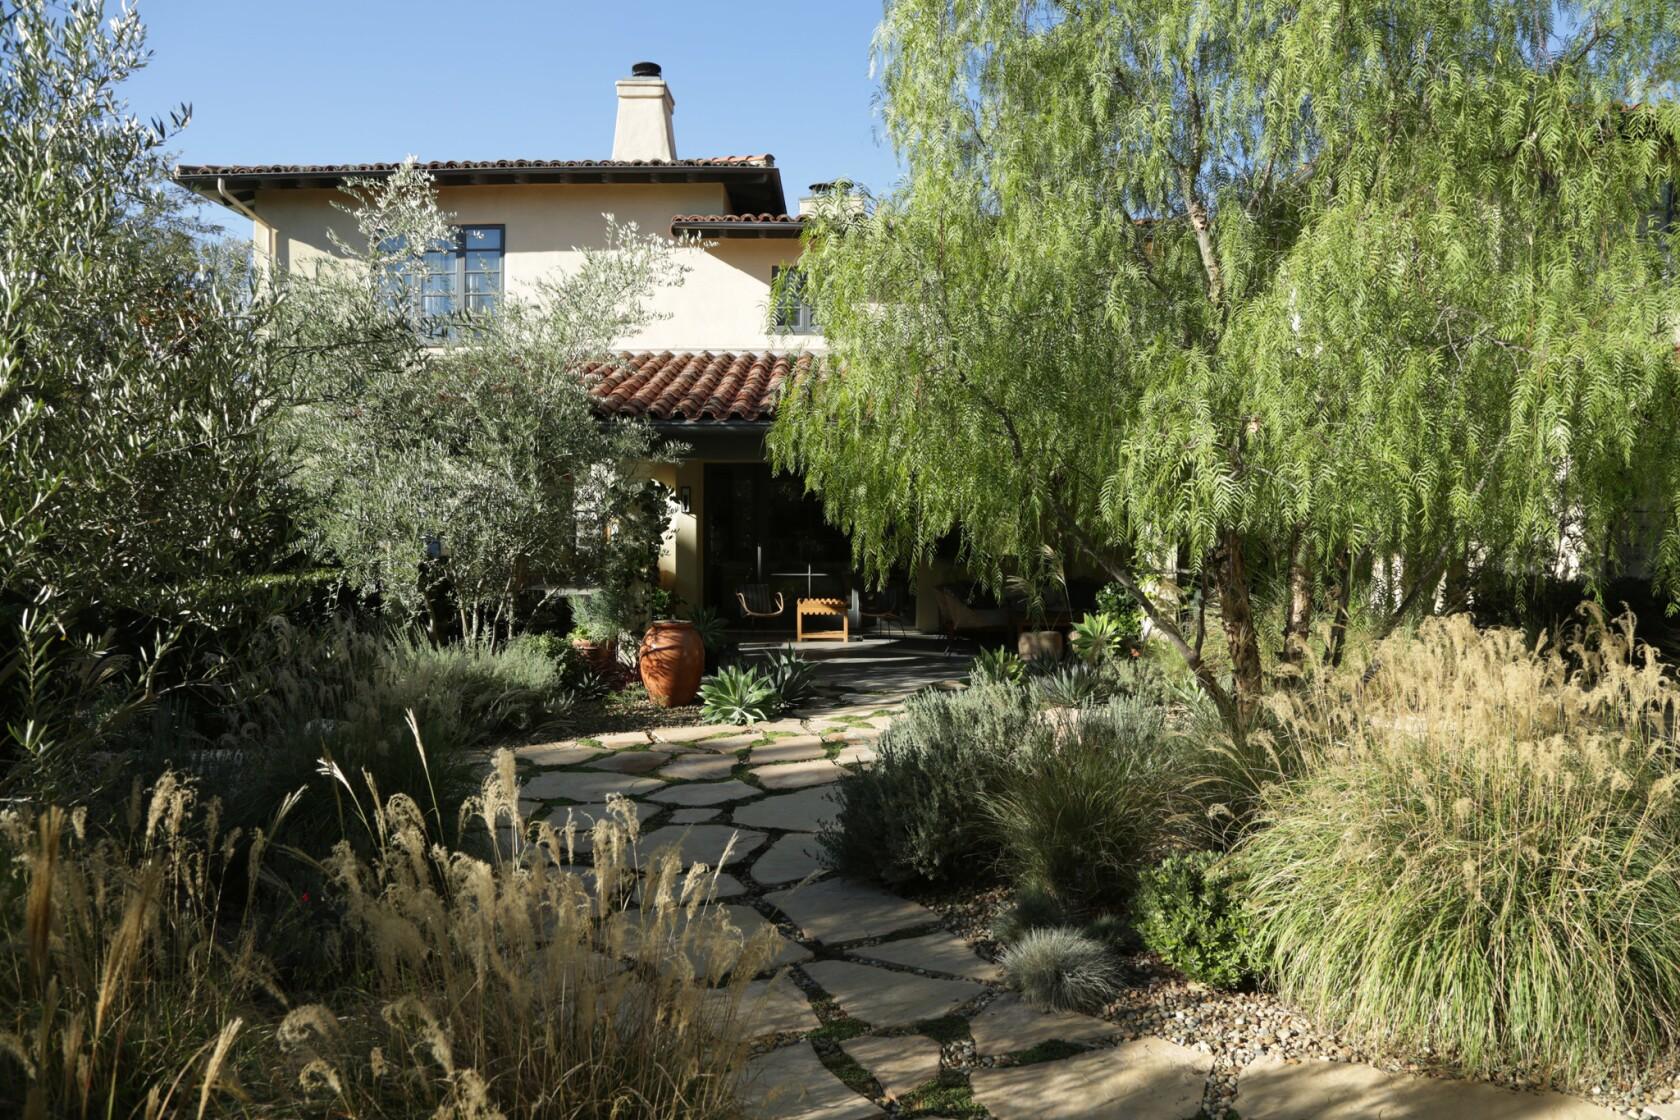 A Boring Lawn Is Now A Lush Mediterranean Garden That Provides